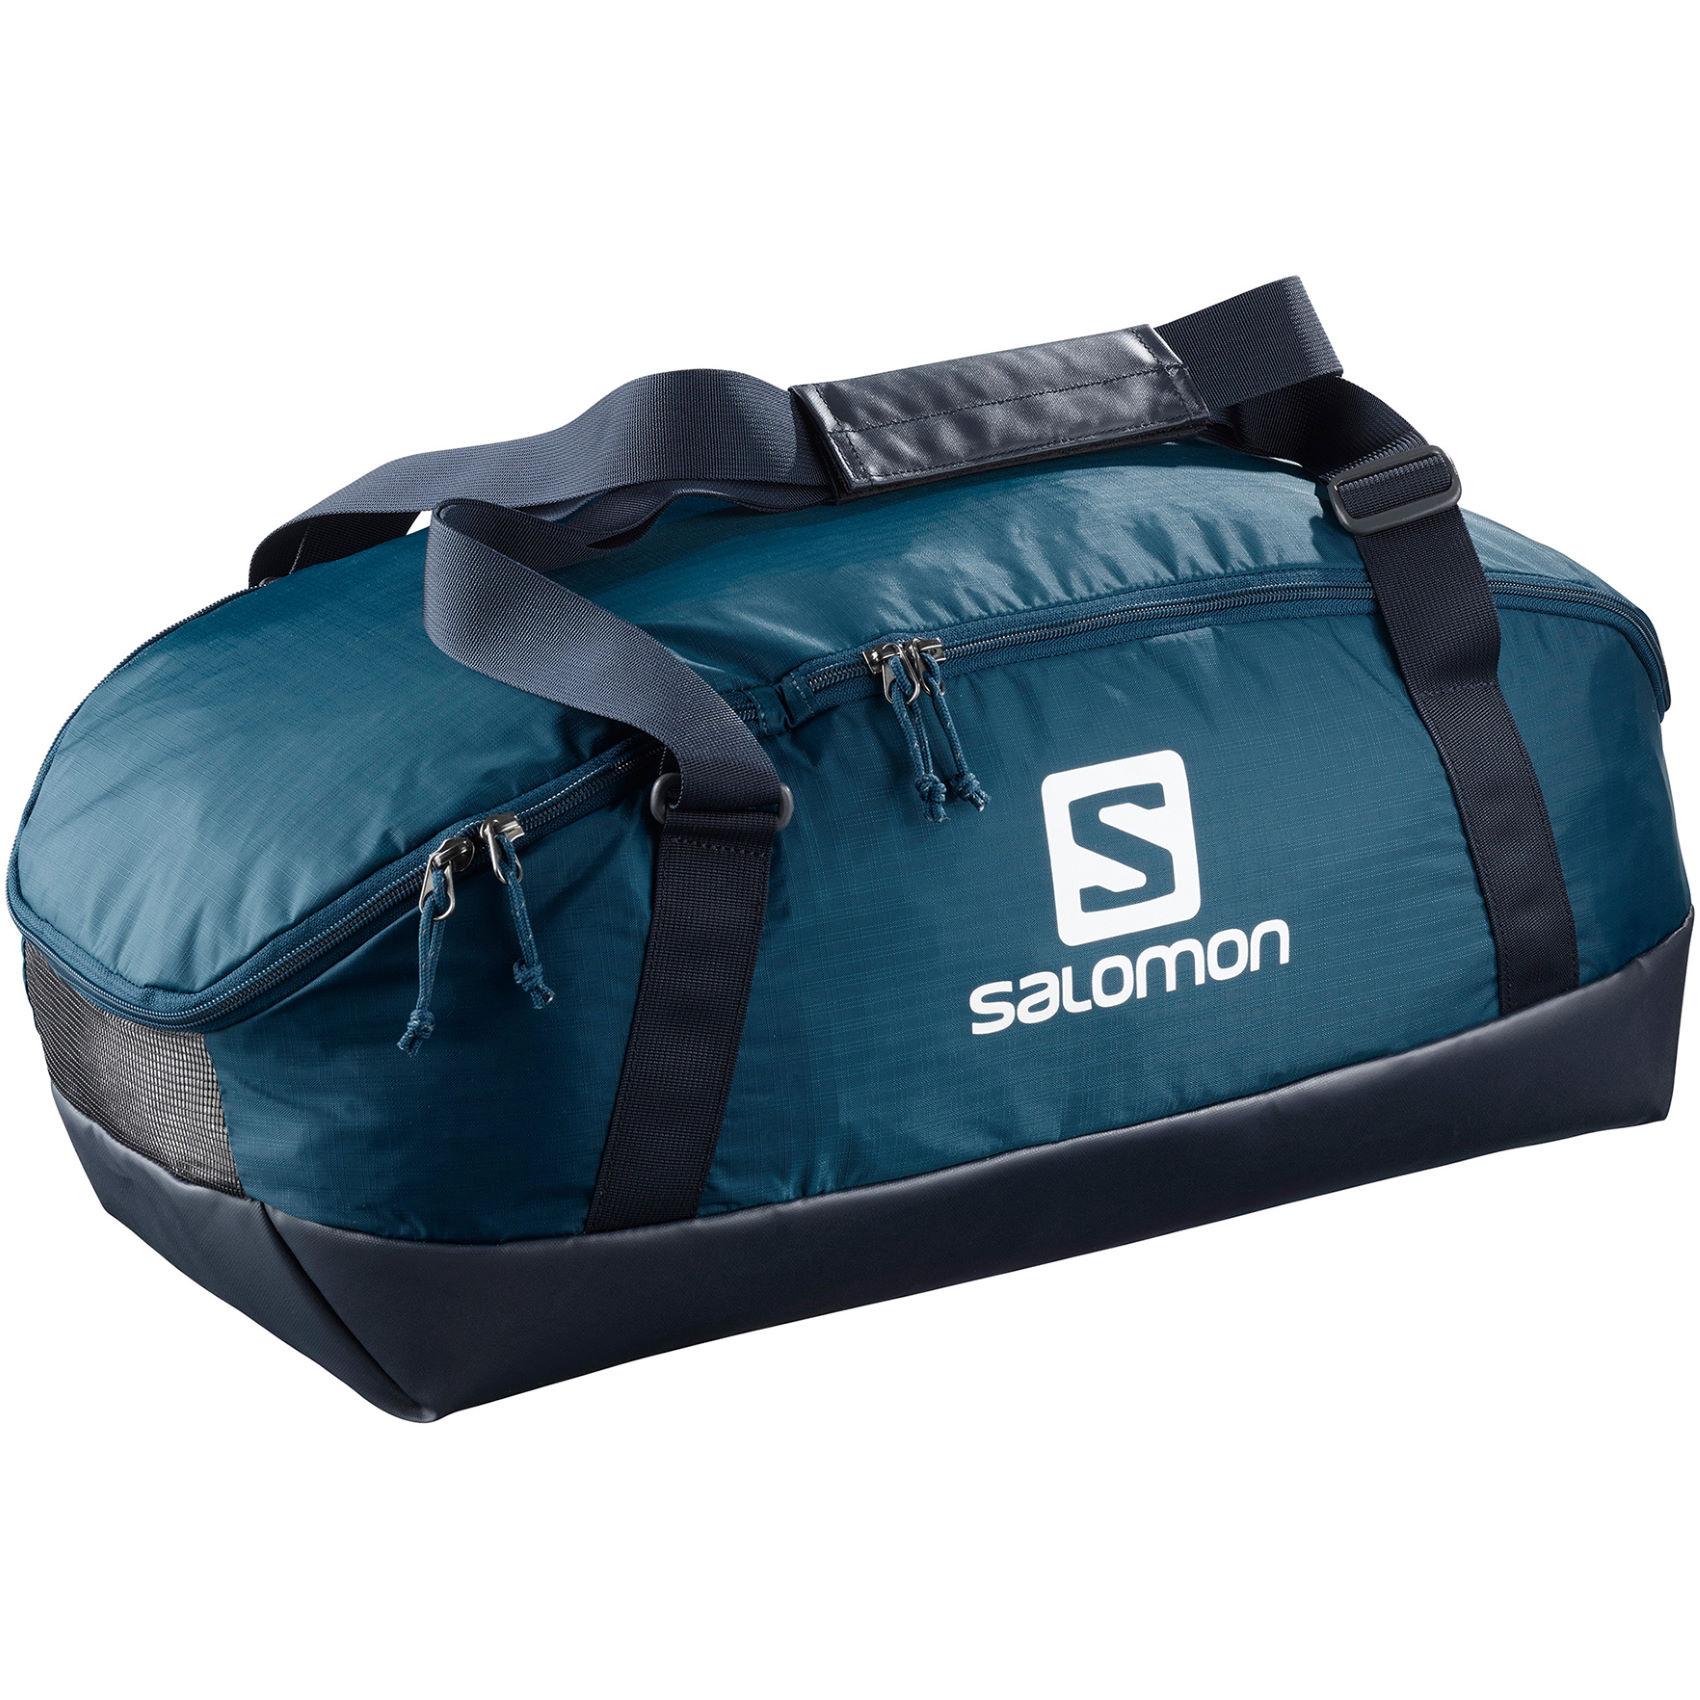 Salomon Prolog 40 · Productos Salomon · Bolsos · Kukimbia Shop - Tienda Online Trail & Running